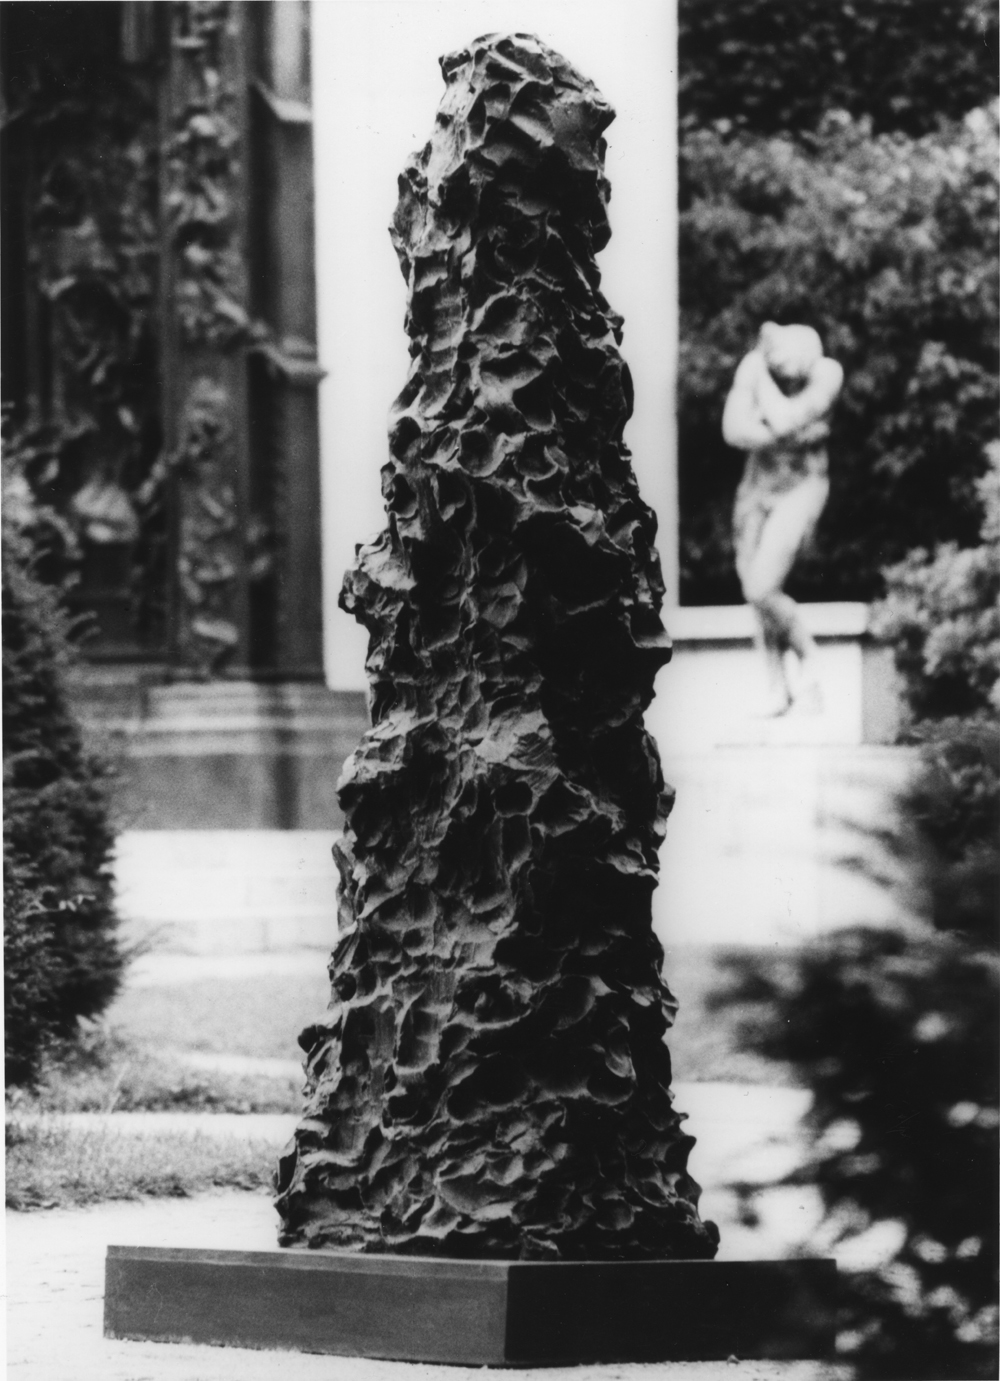 1985_AK_Exposition Musee Rodin_Paris_Grande NuditeI_81'_205cm.jpg